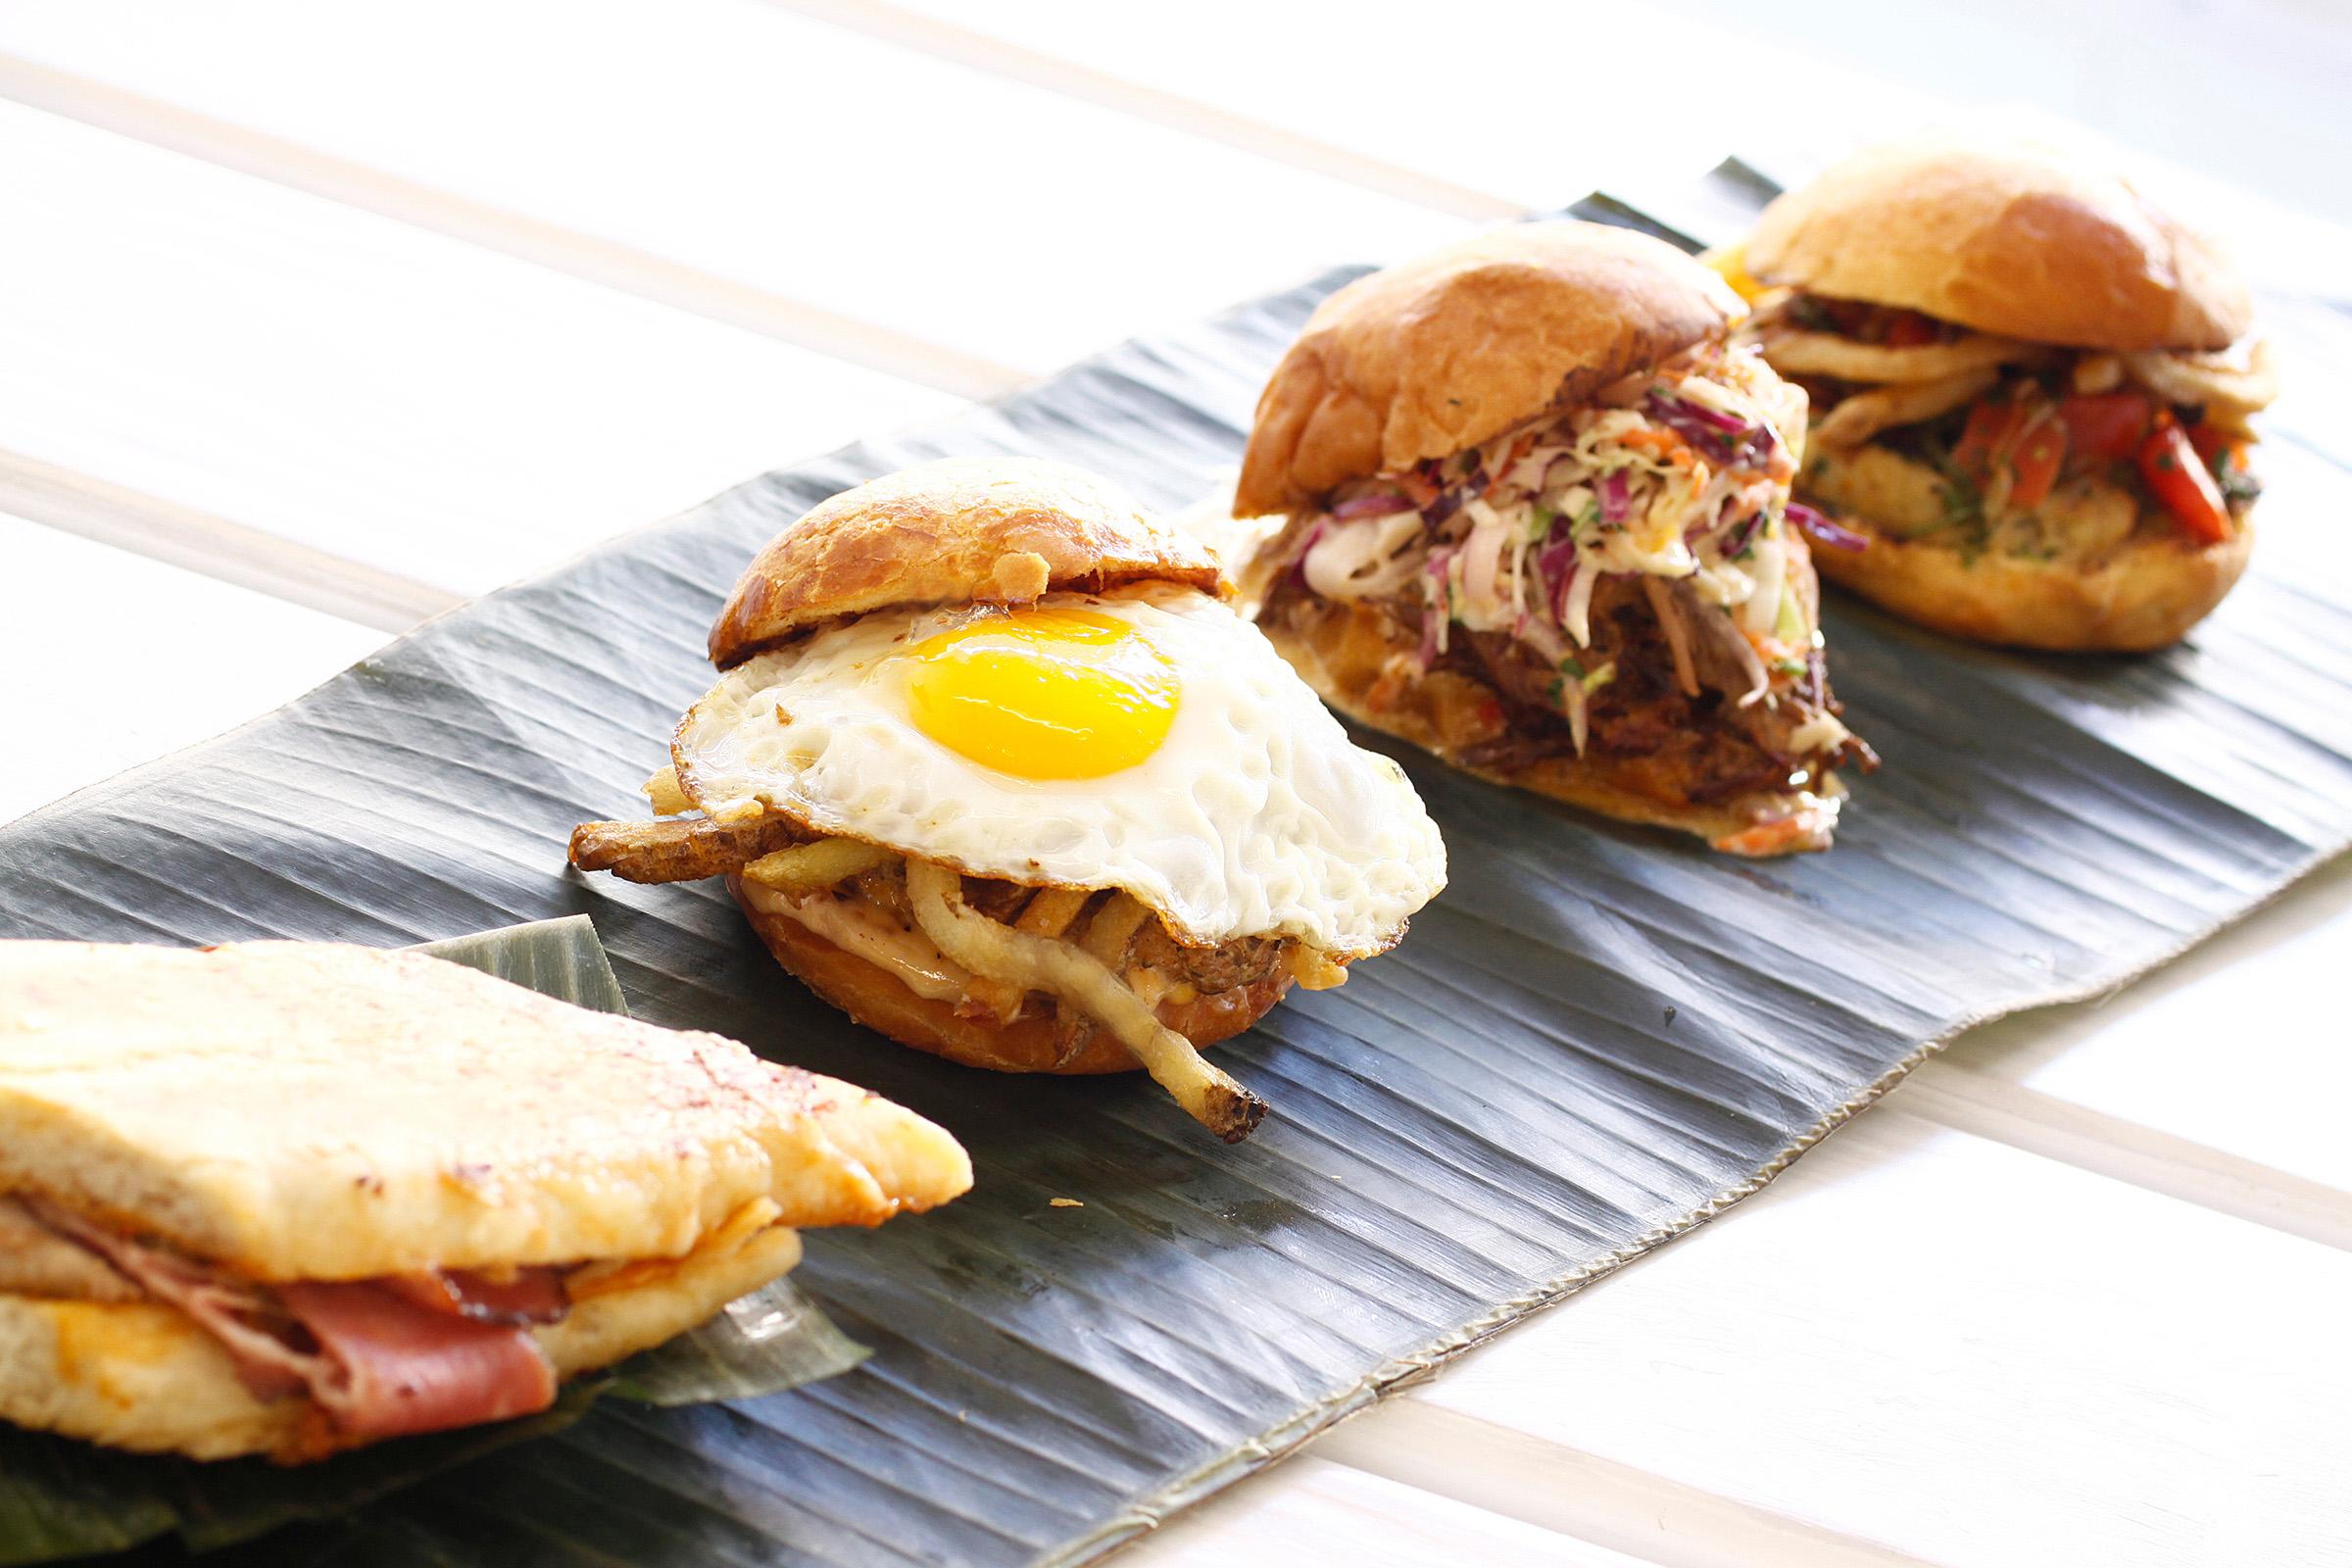 Cuban Burger Spot Frita Batidos Aims for Mid-July Debut in Detroit